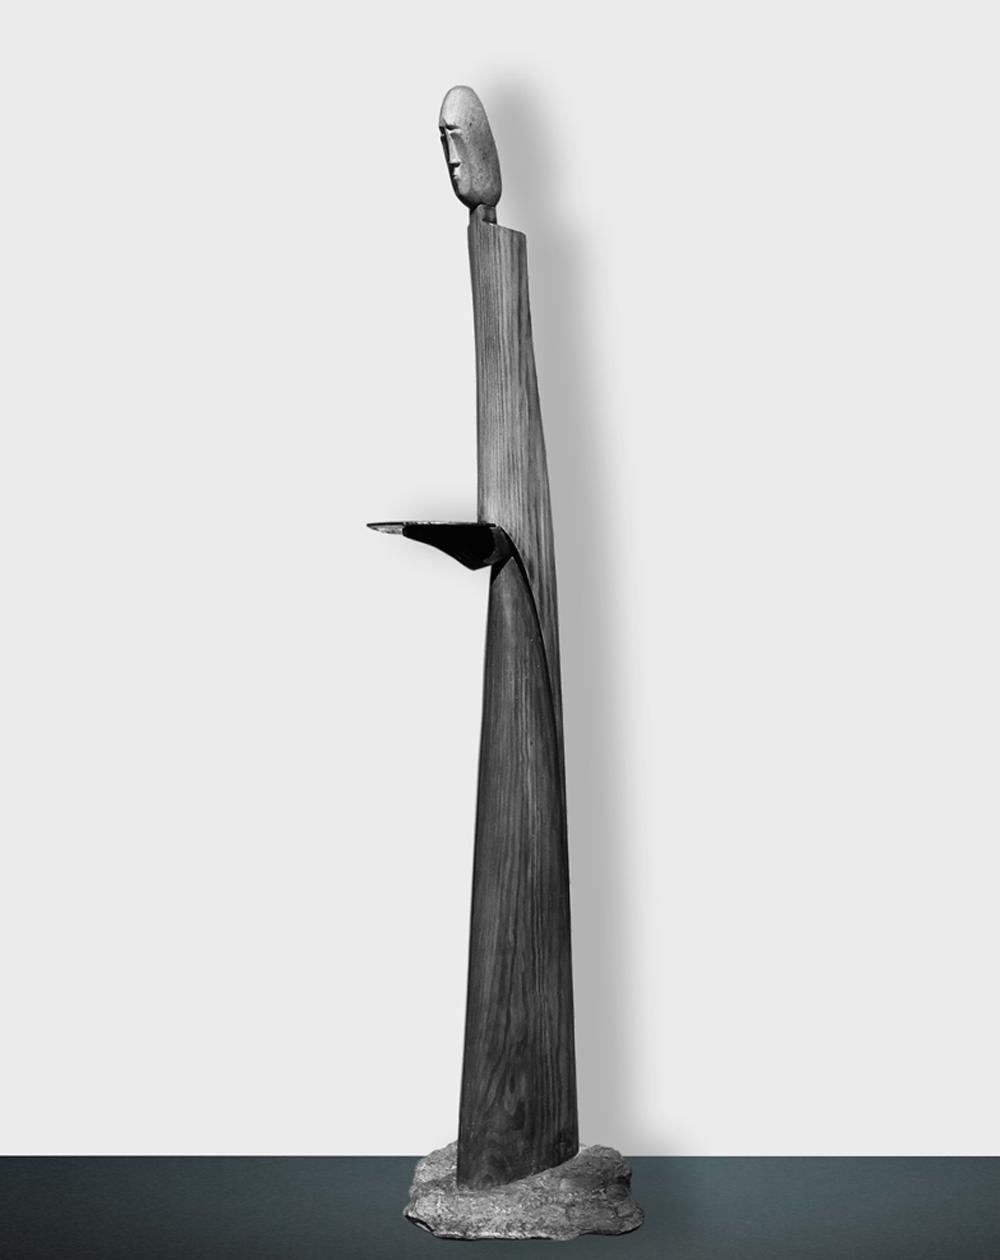 054 -SERVUS - 1989 - wood / stone / iron - 170 x 42 x 41 cm.